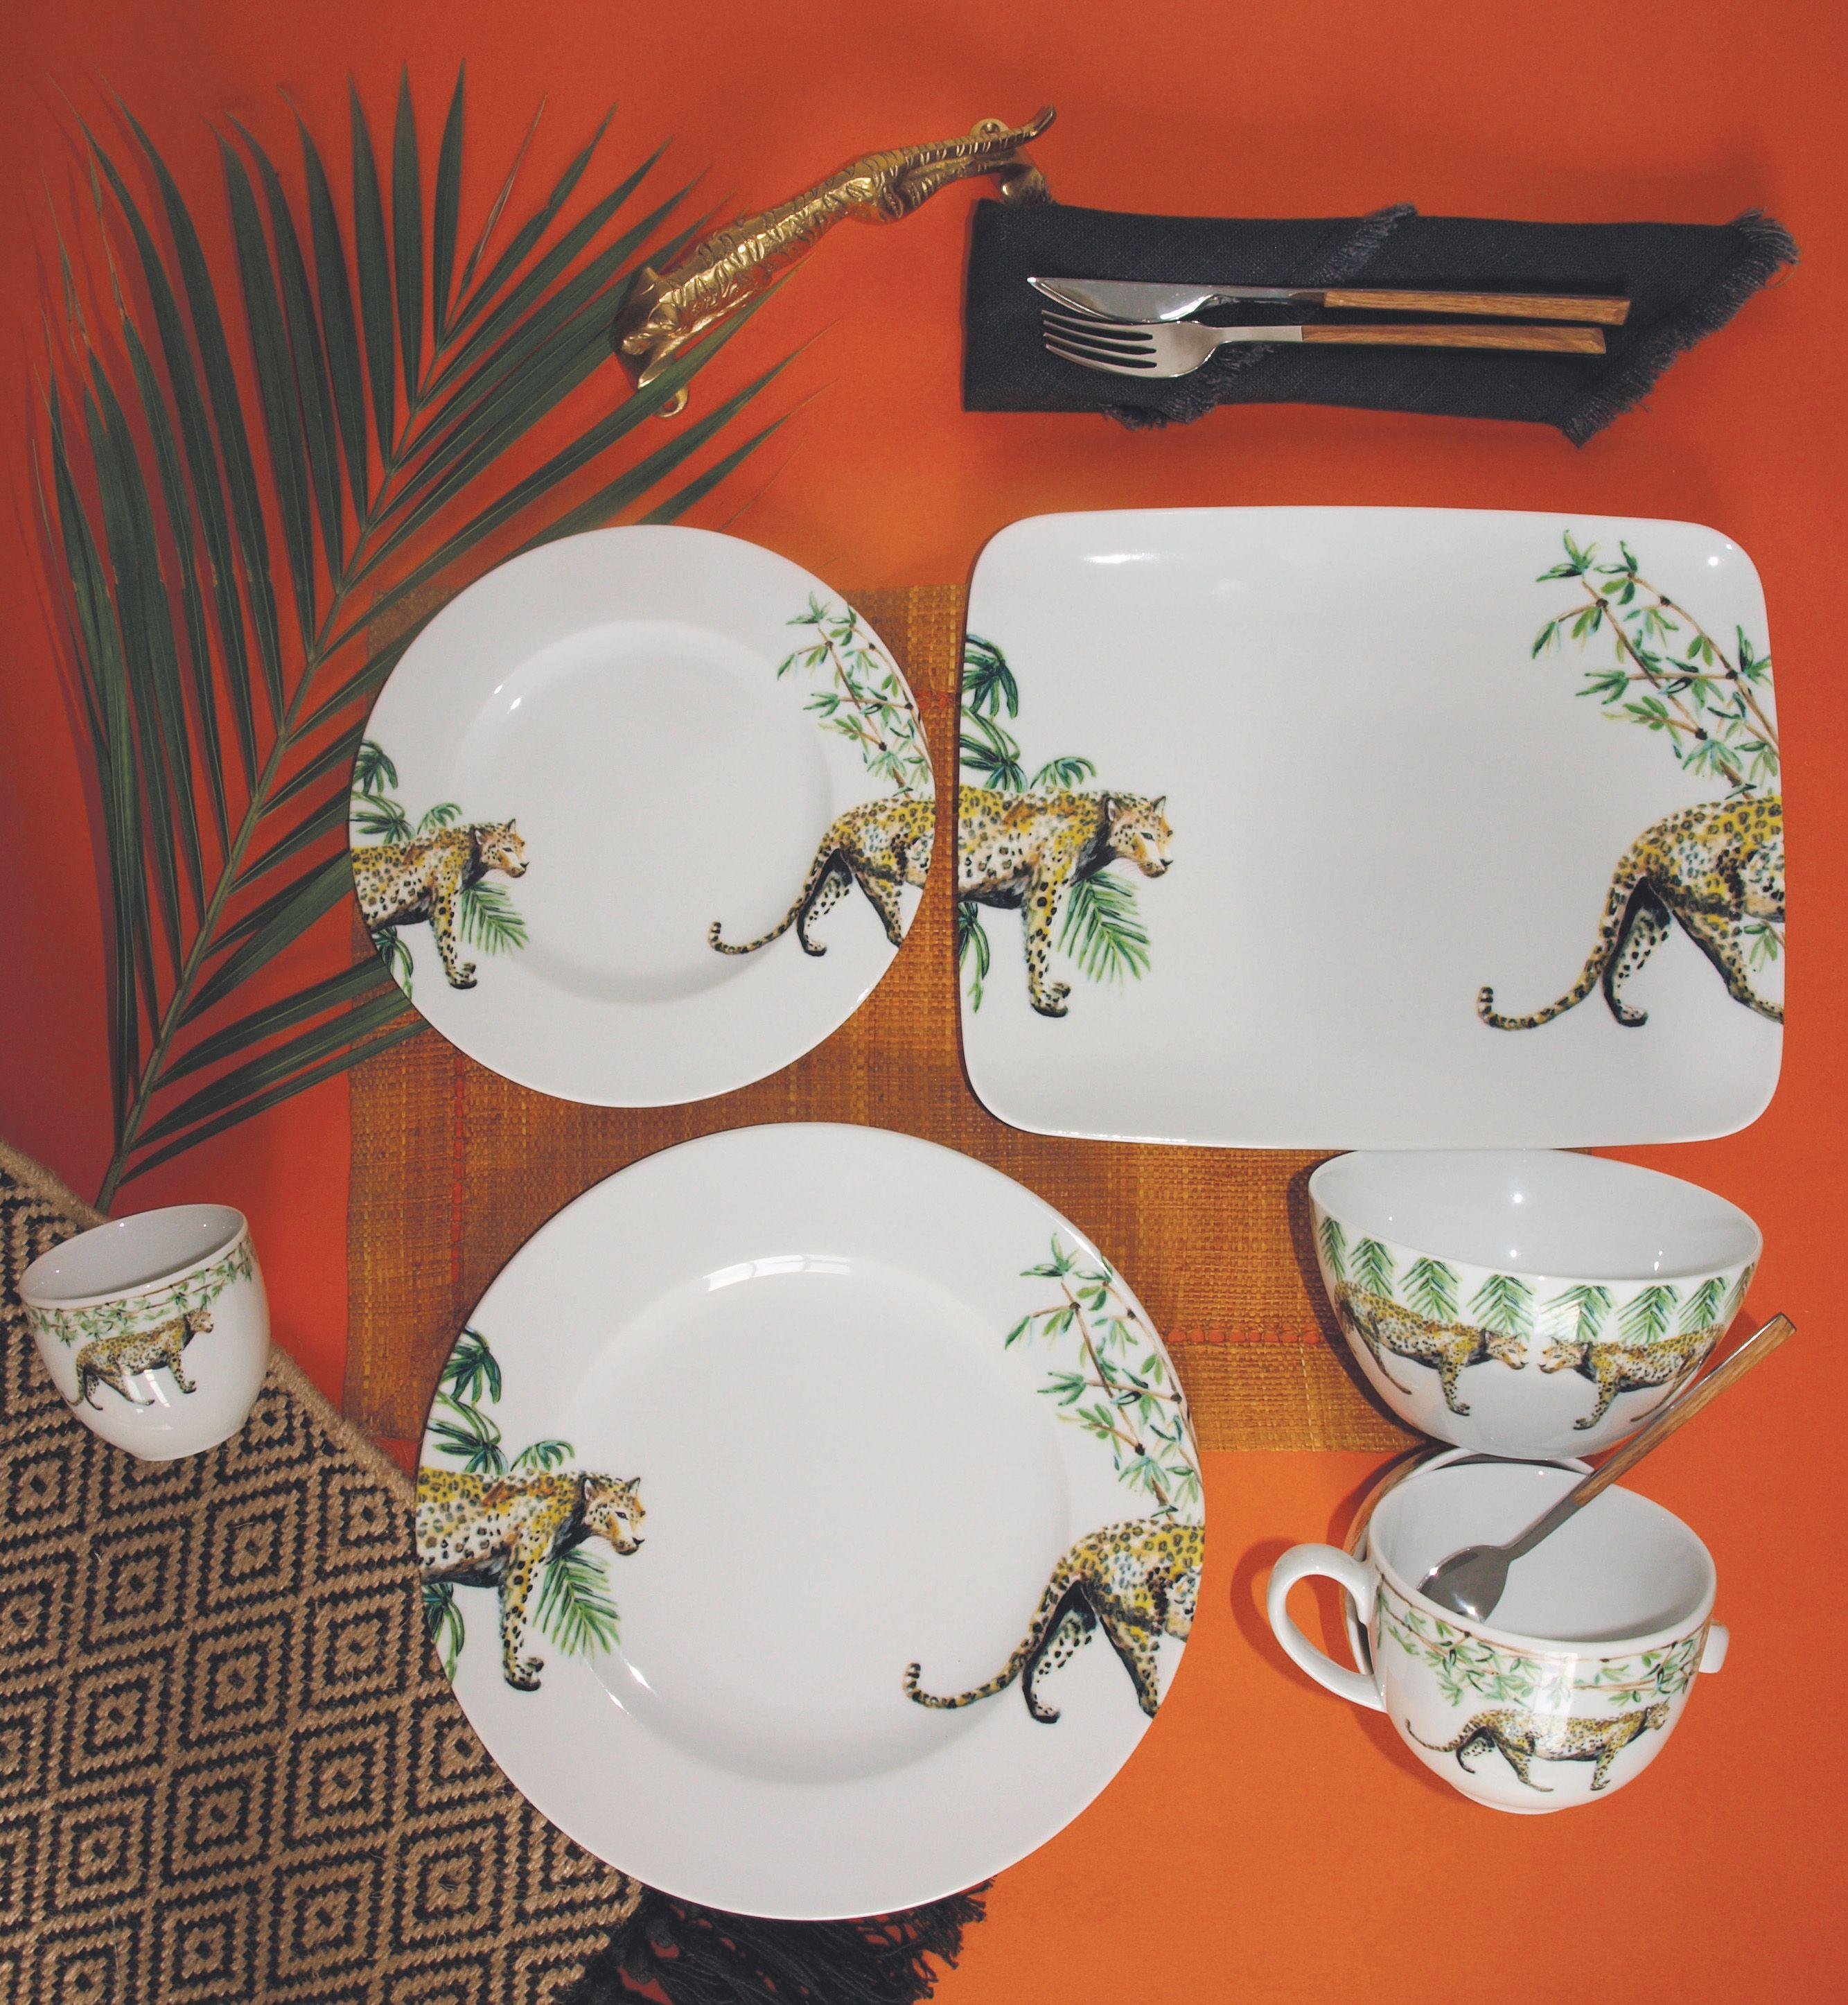 Catchii porcelain dinnerware dutch design new collection microwave safe dishwasher safe & Catchii porcelain dinnerware dutch design new collection ...